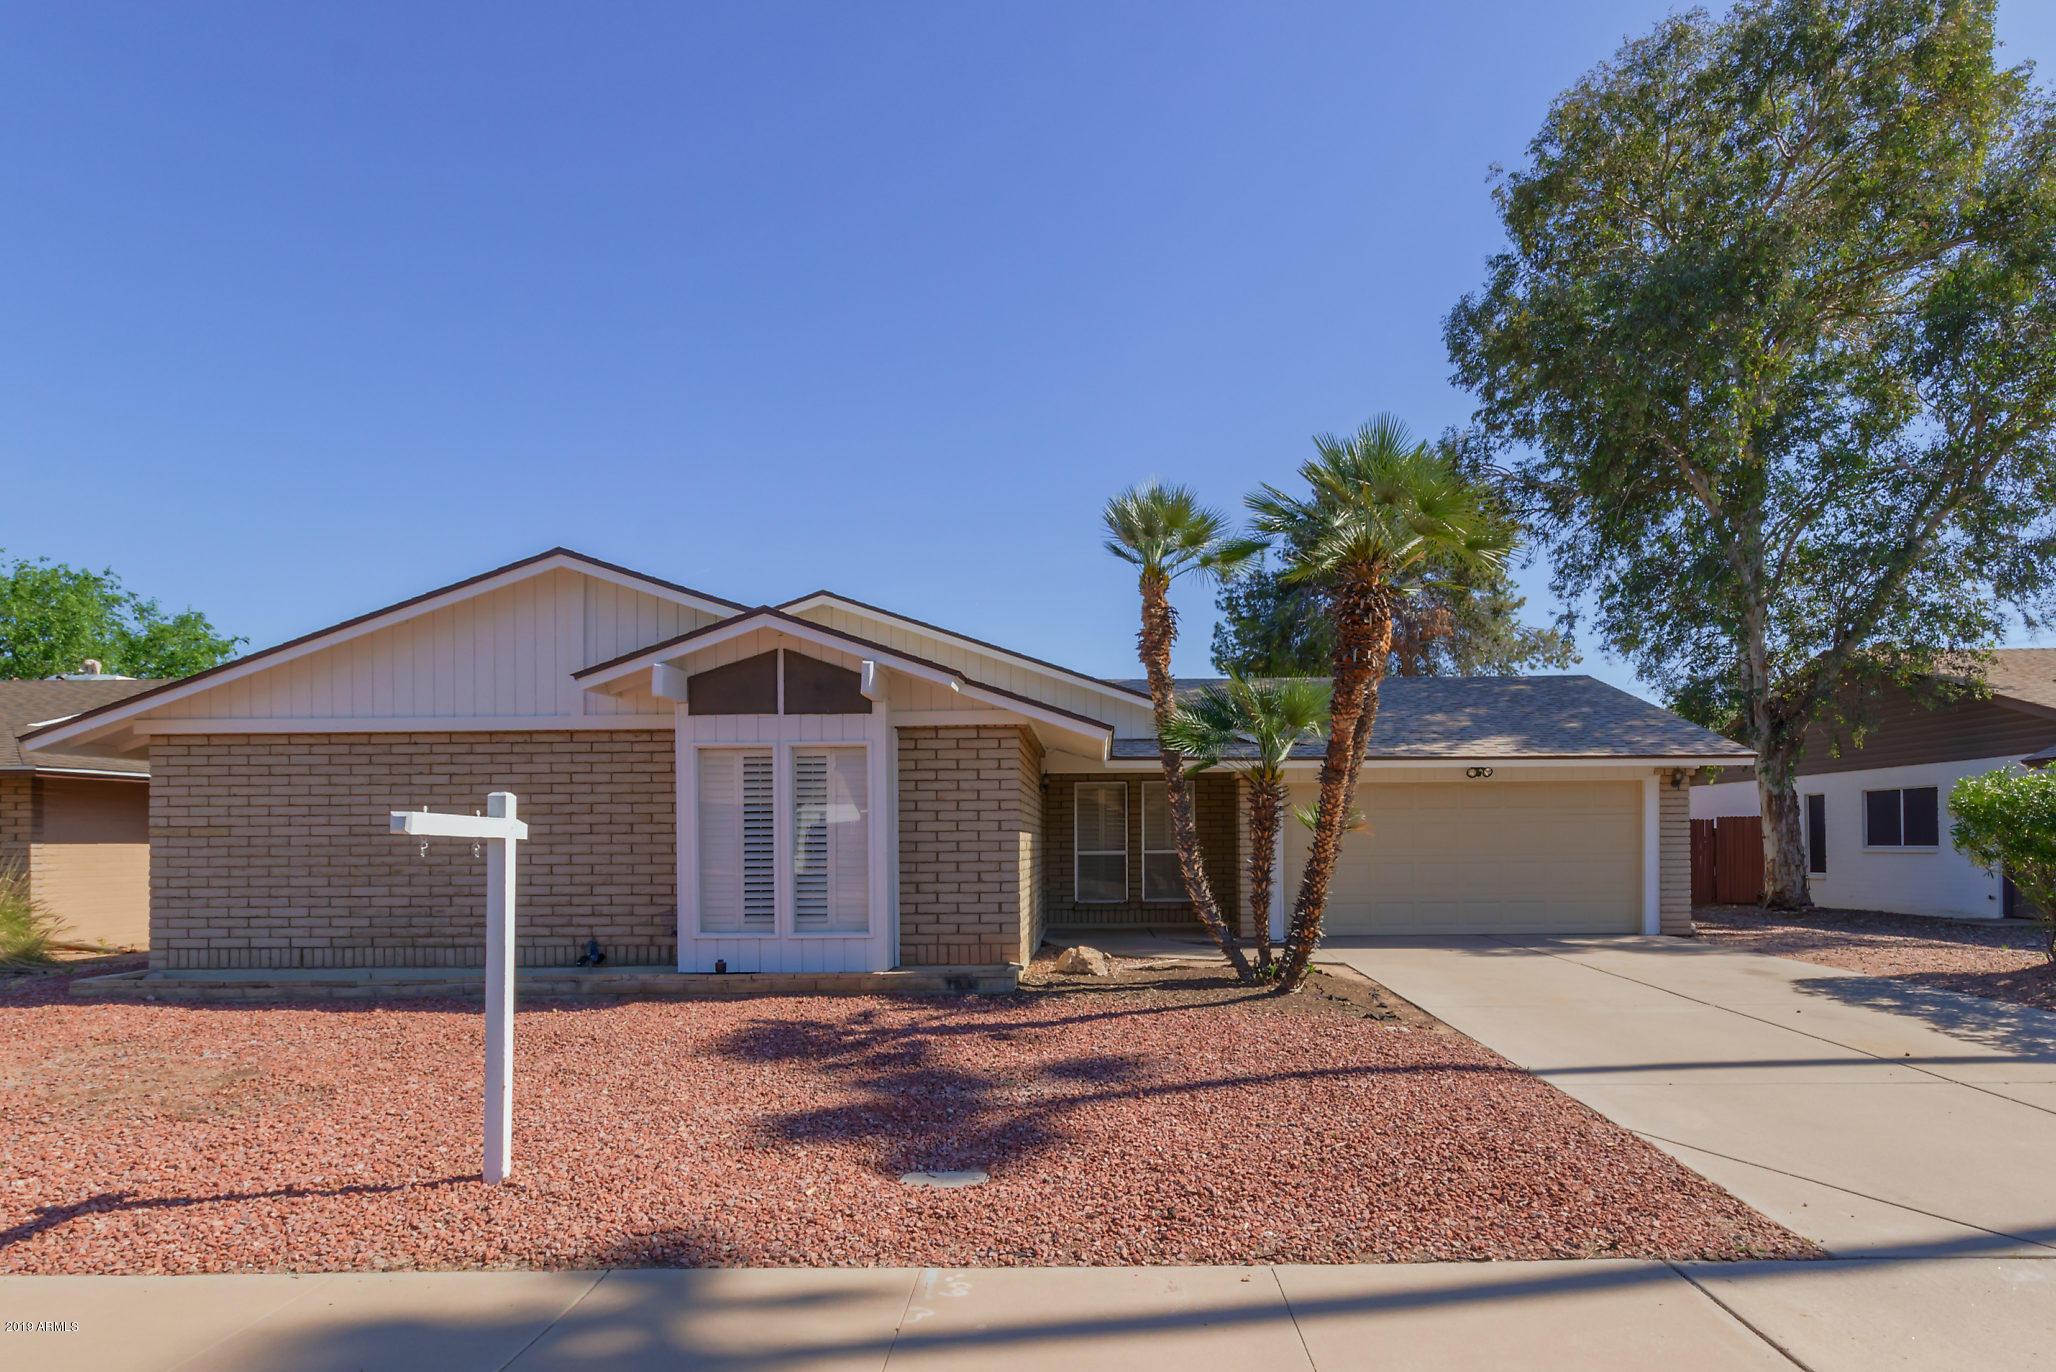 Photo of 1545 W Posada Avenue, Mesa, AZ 85202